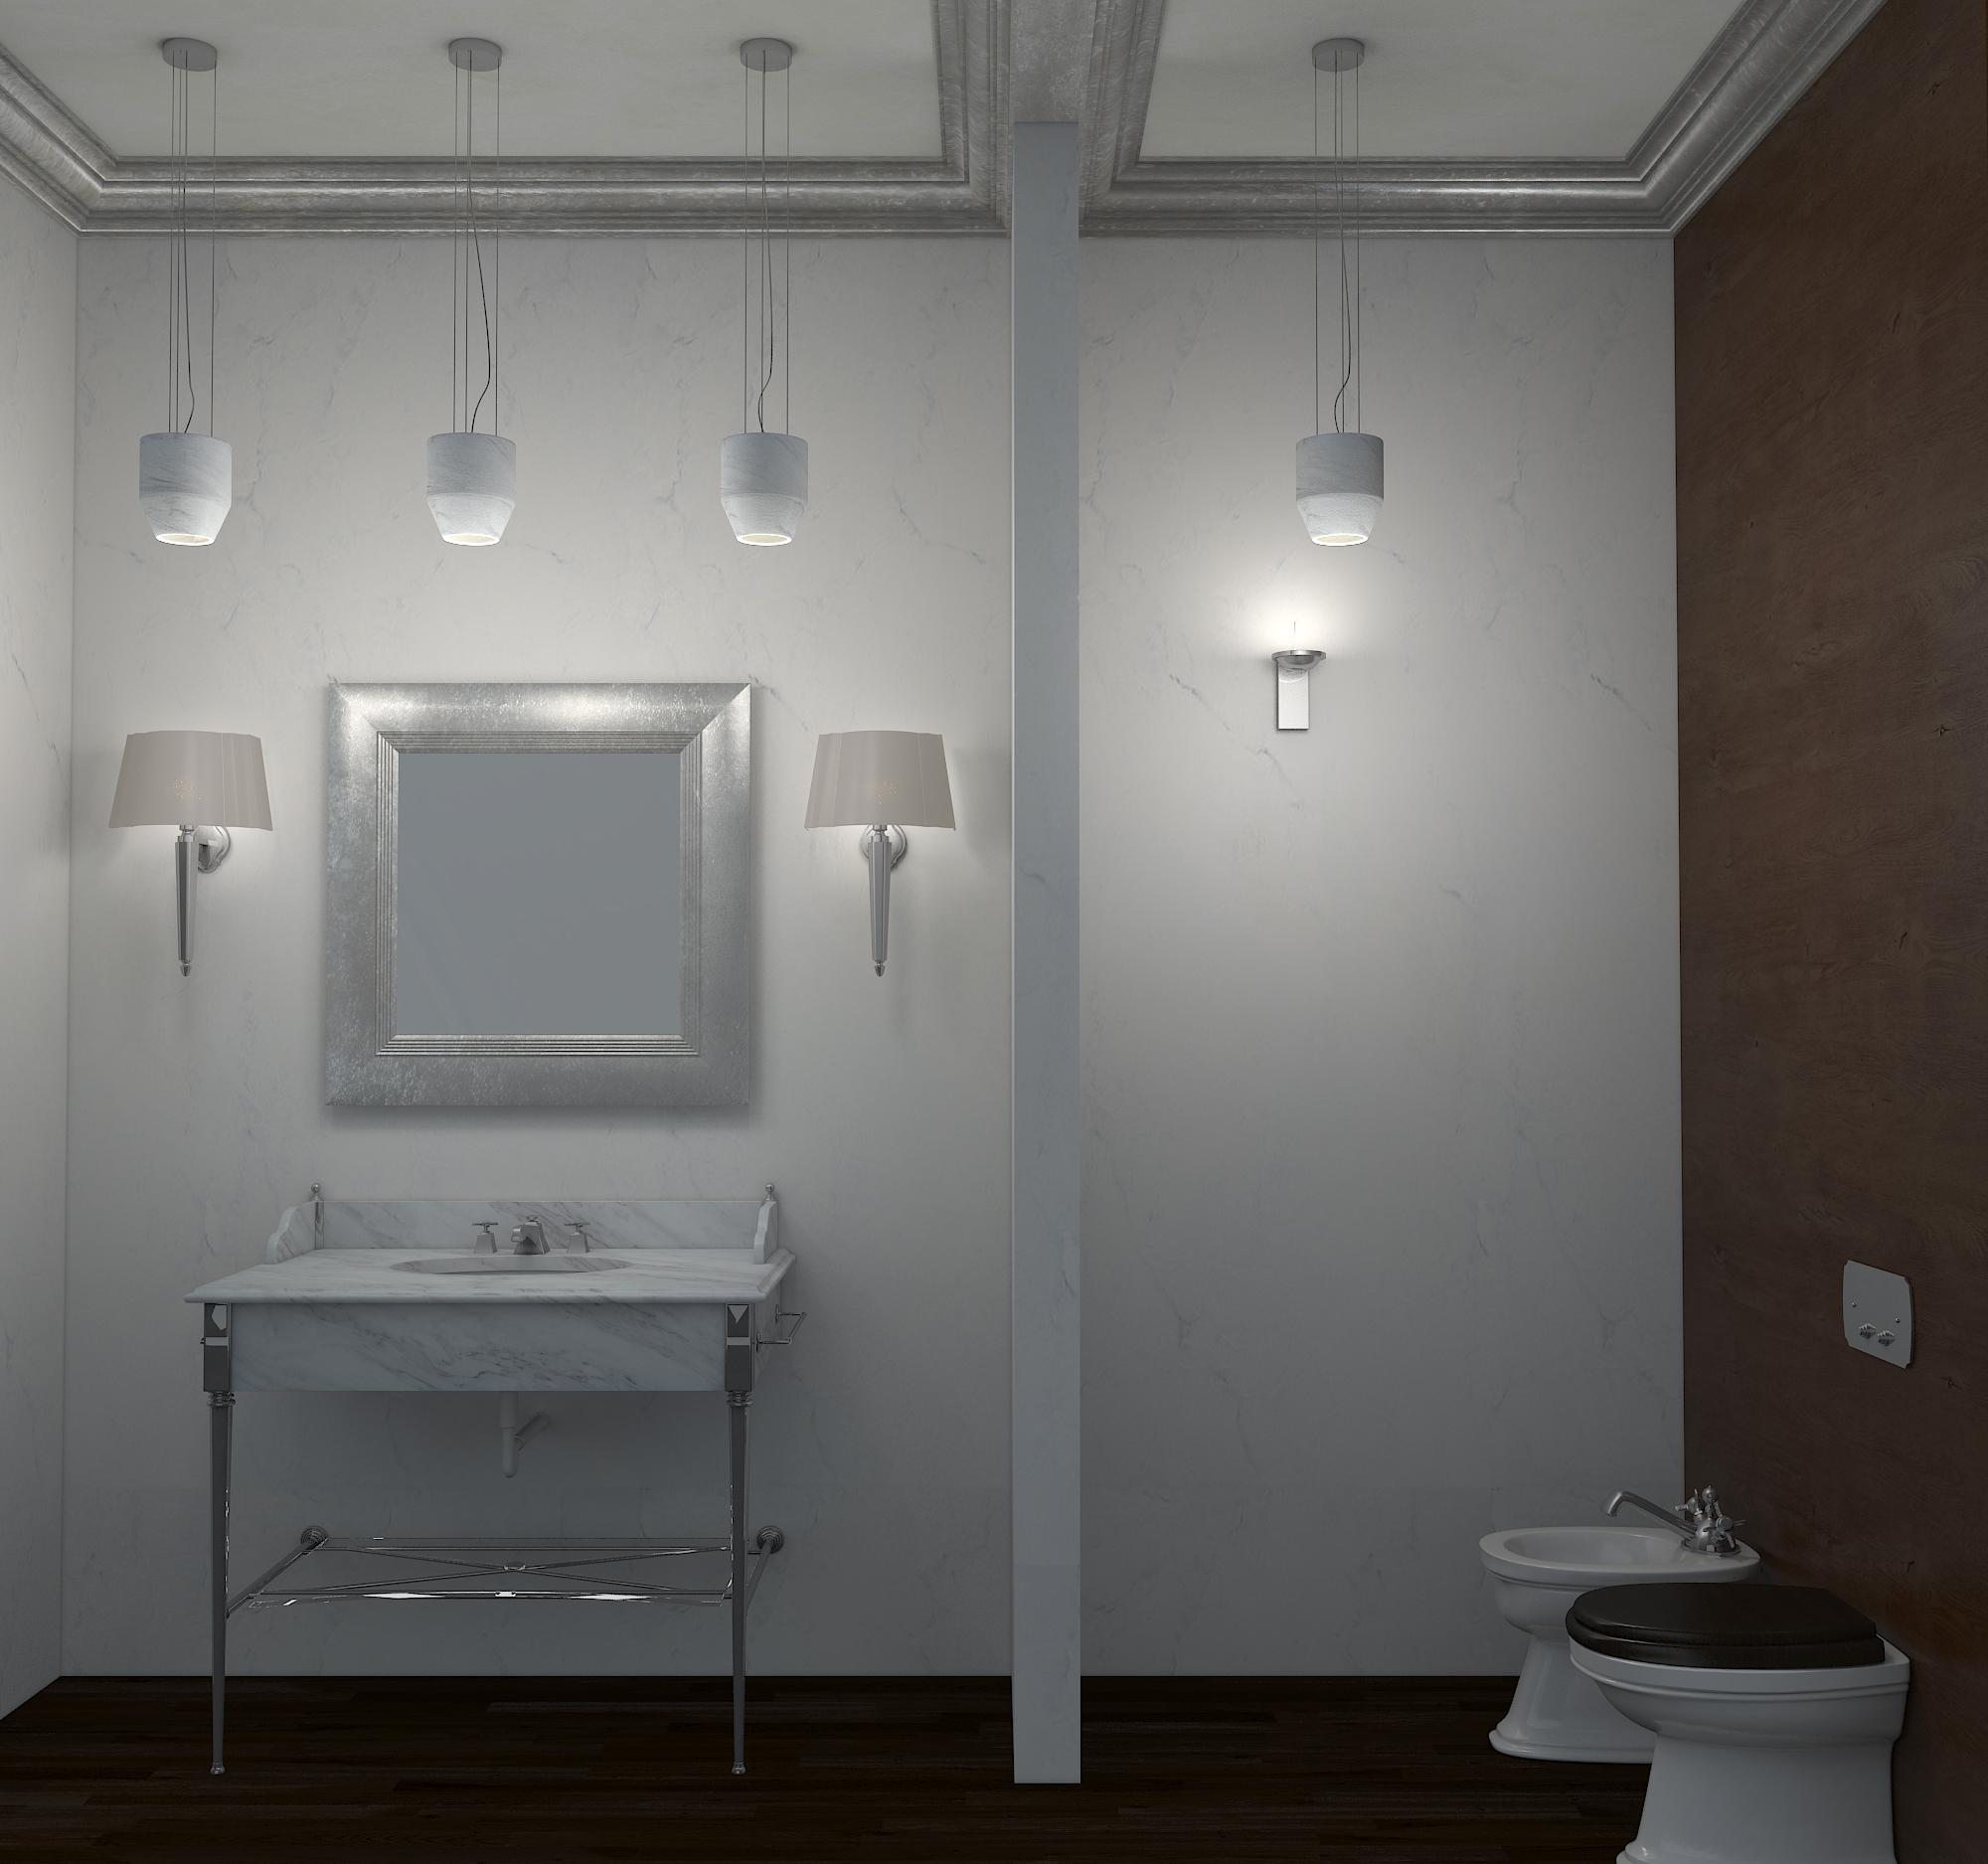 presentation_Parallel House_12.jpg